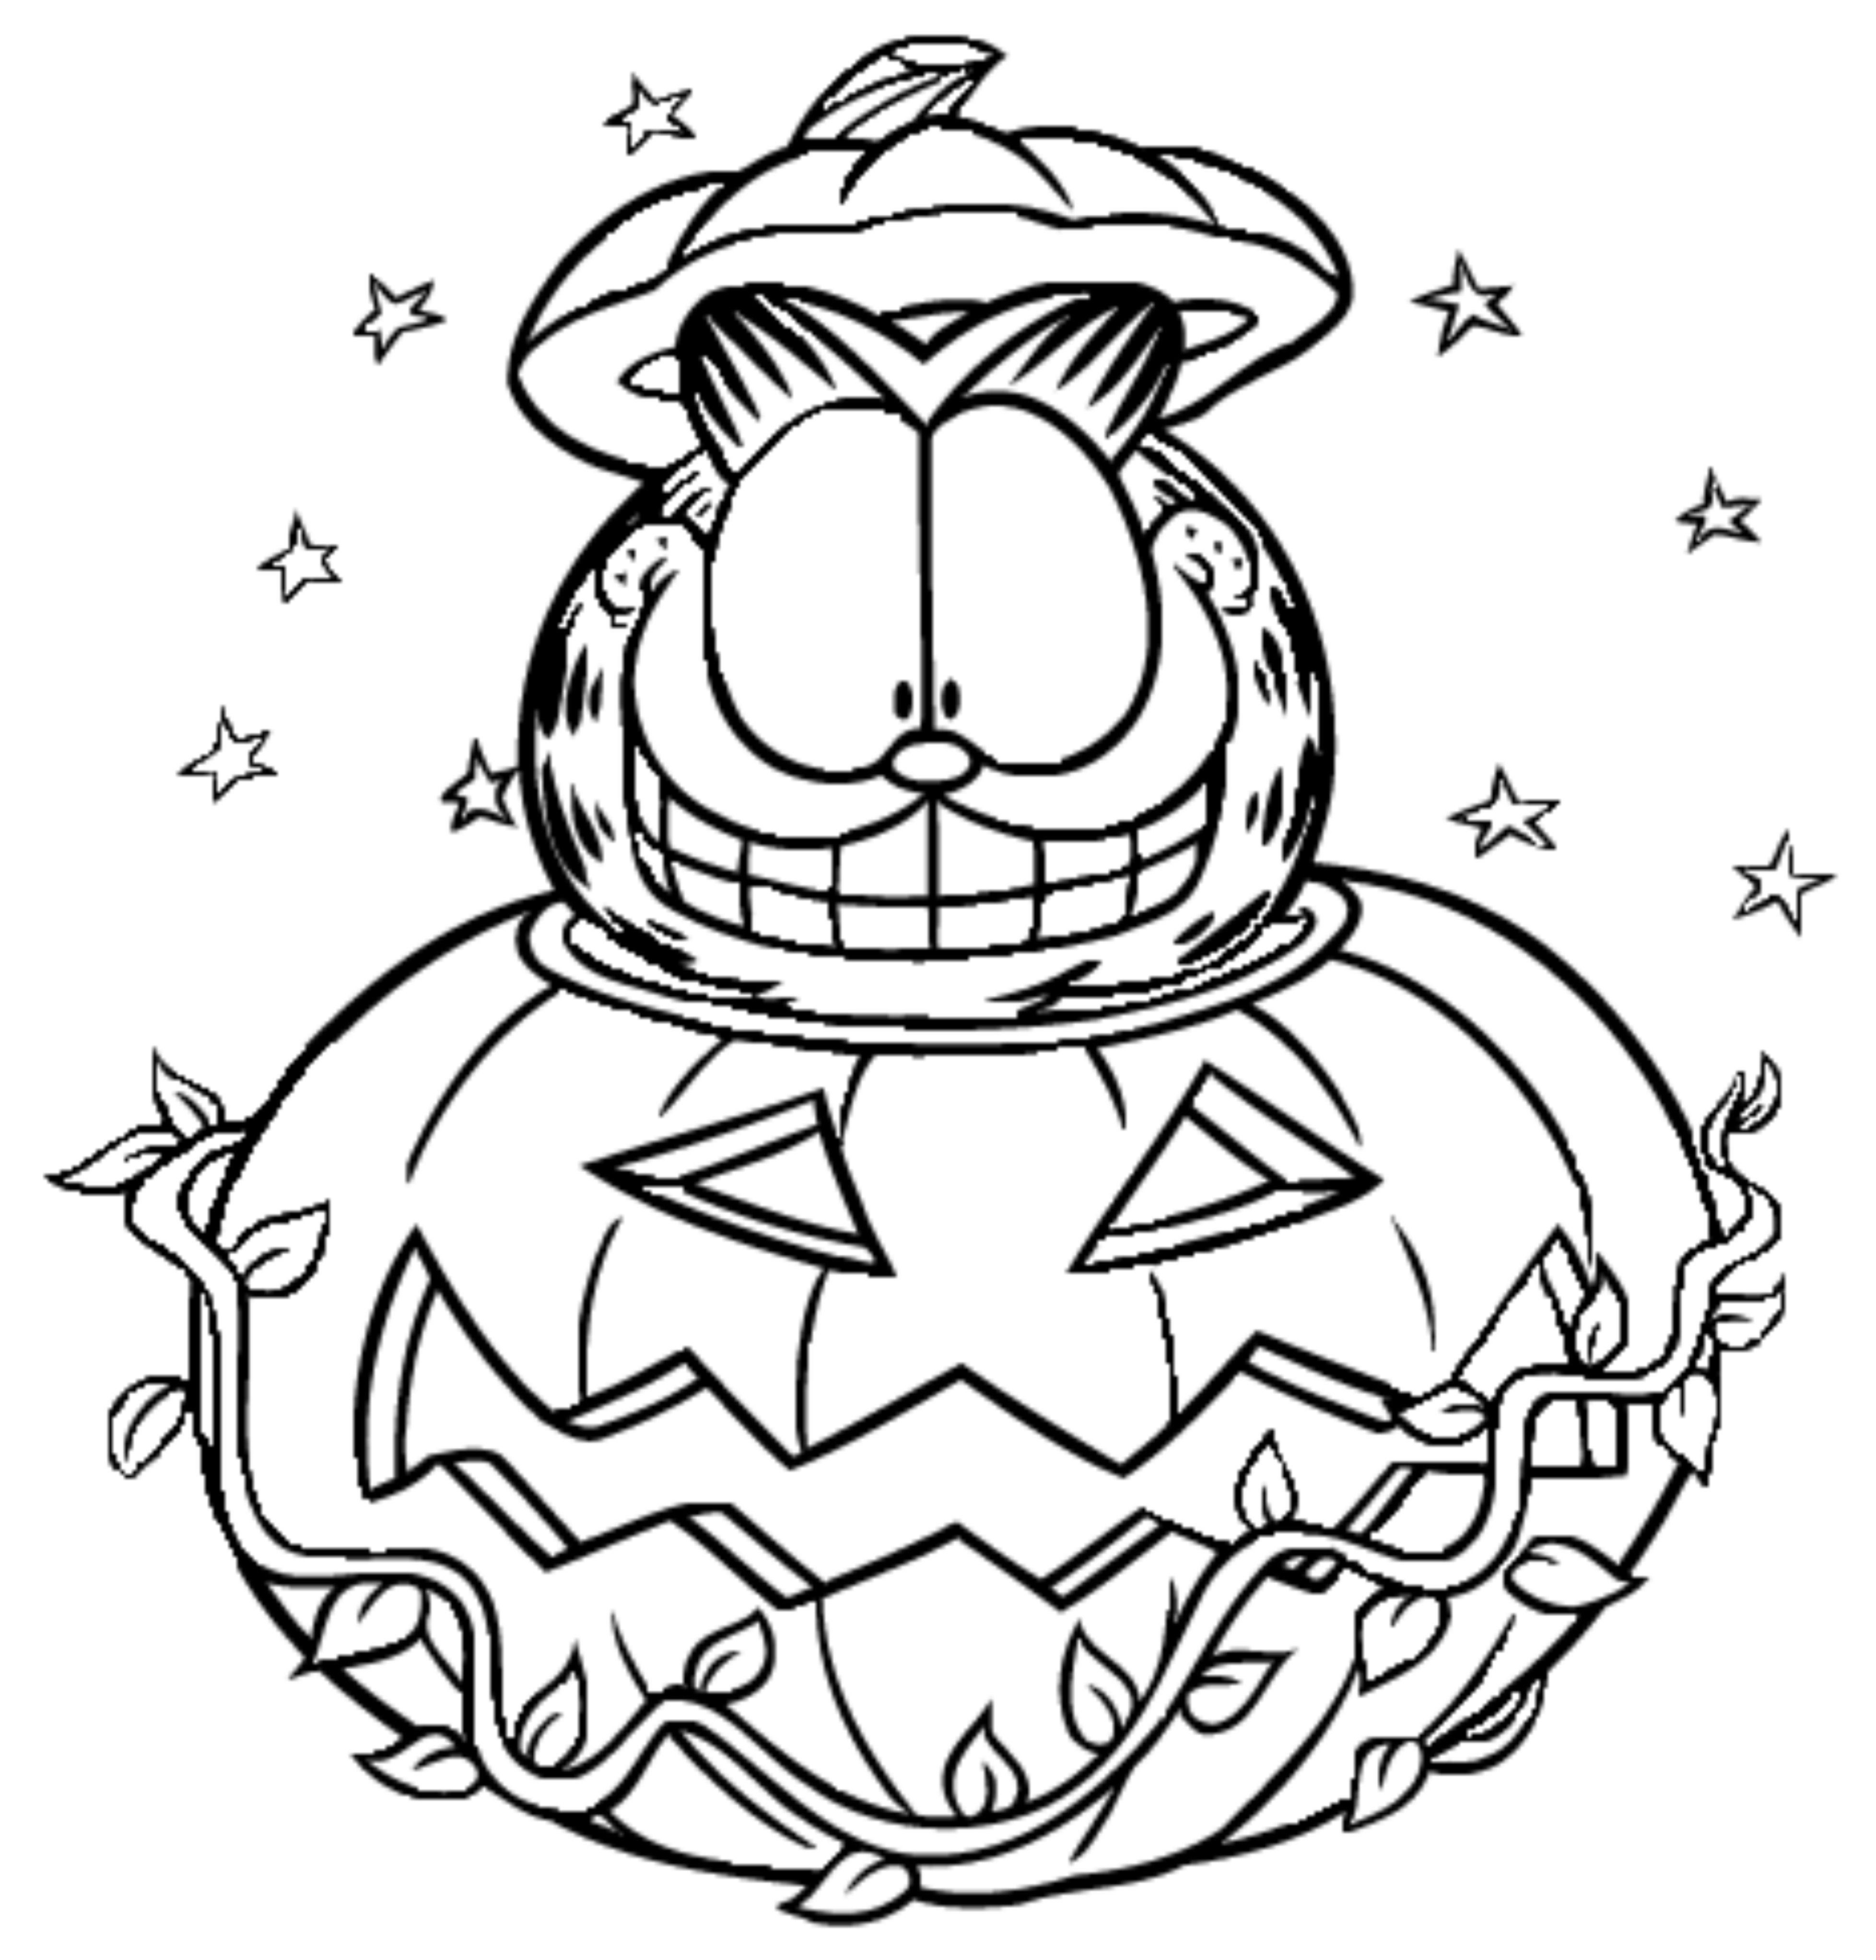 coloring page halloween garfield pumpkin - Garfield Halloween Coloring Pages